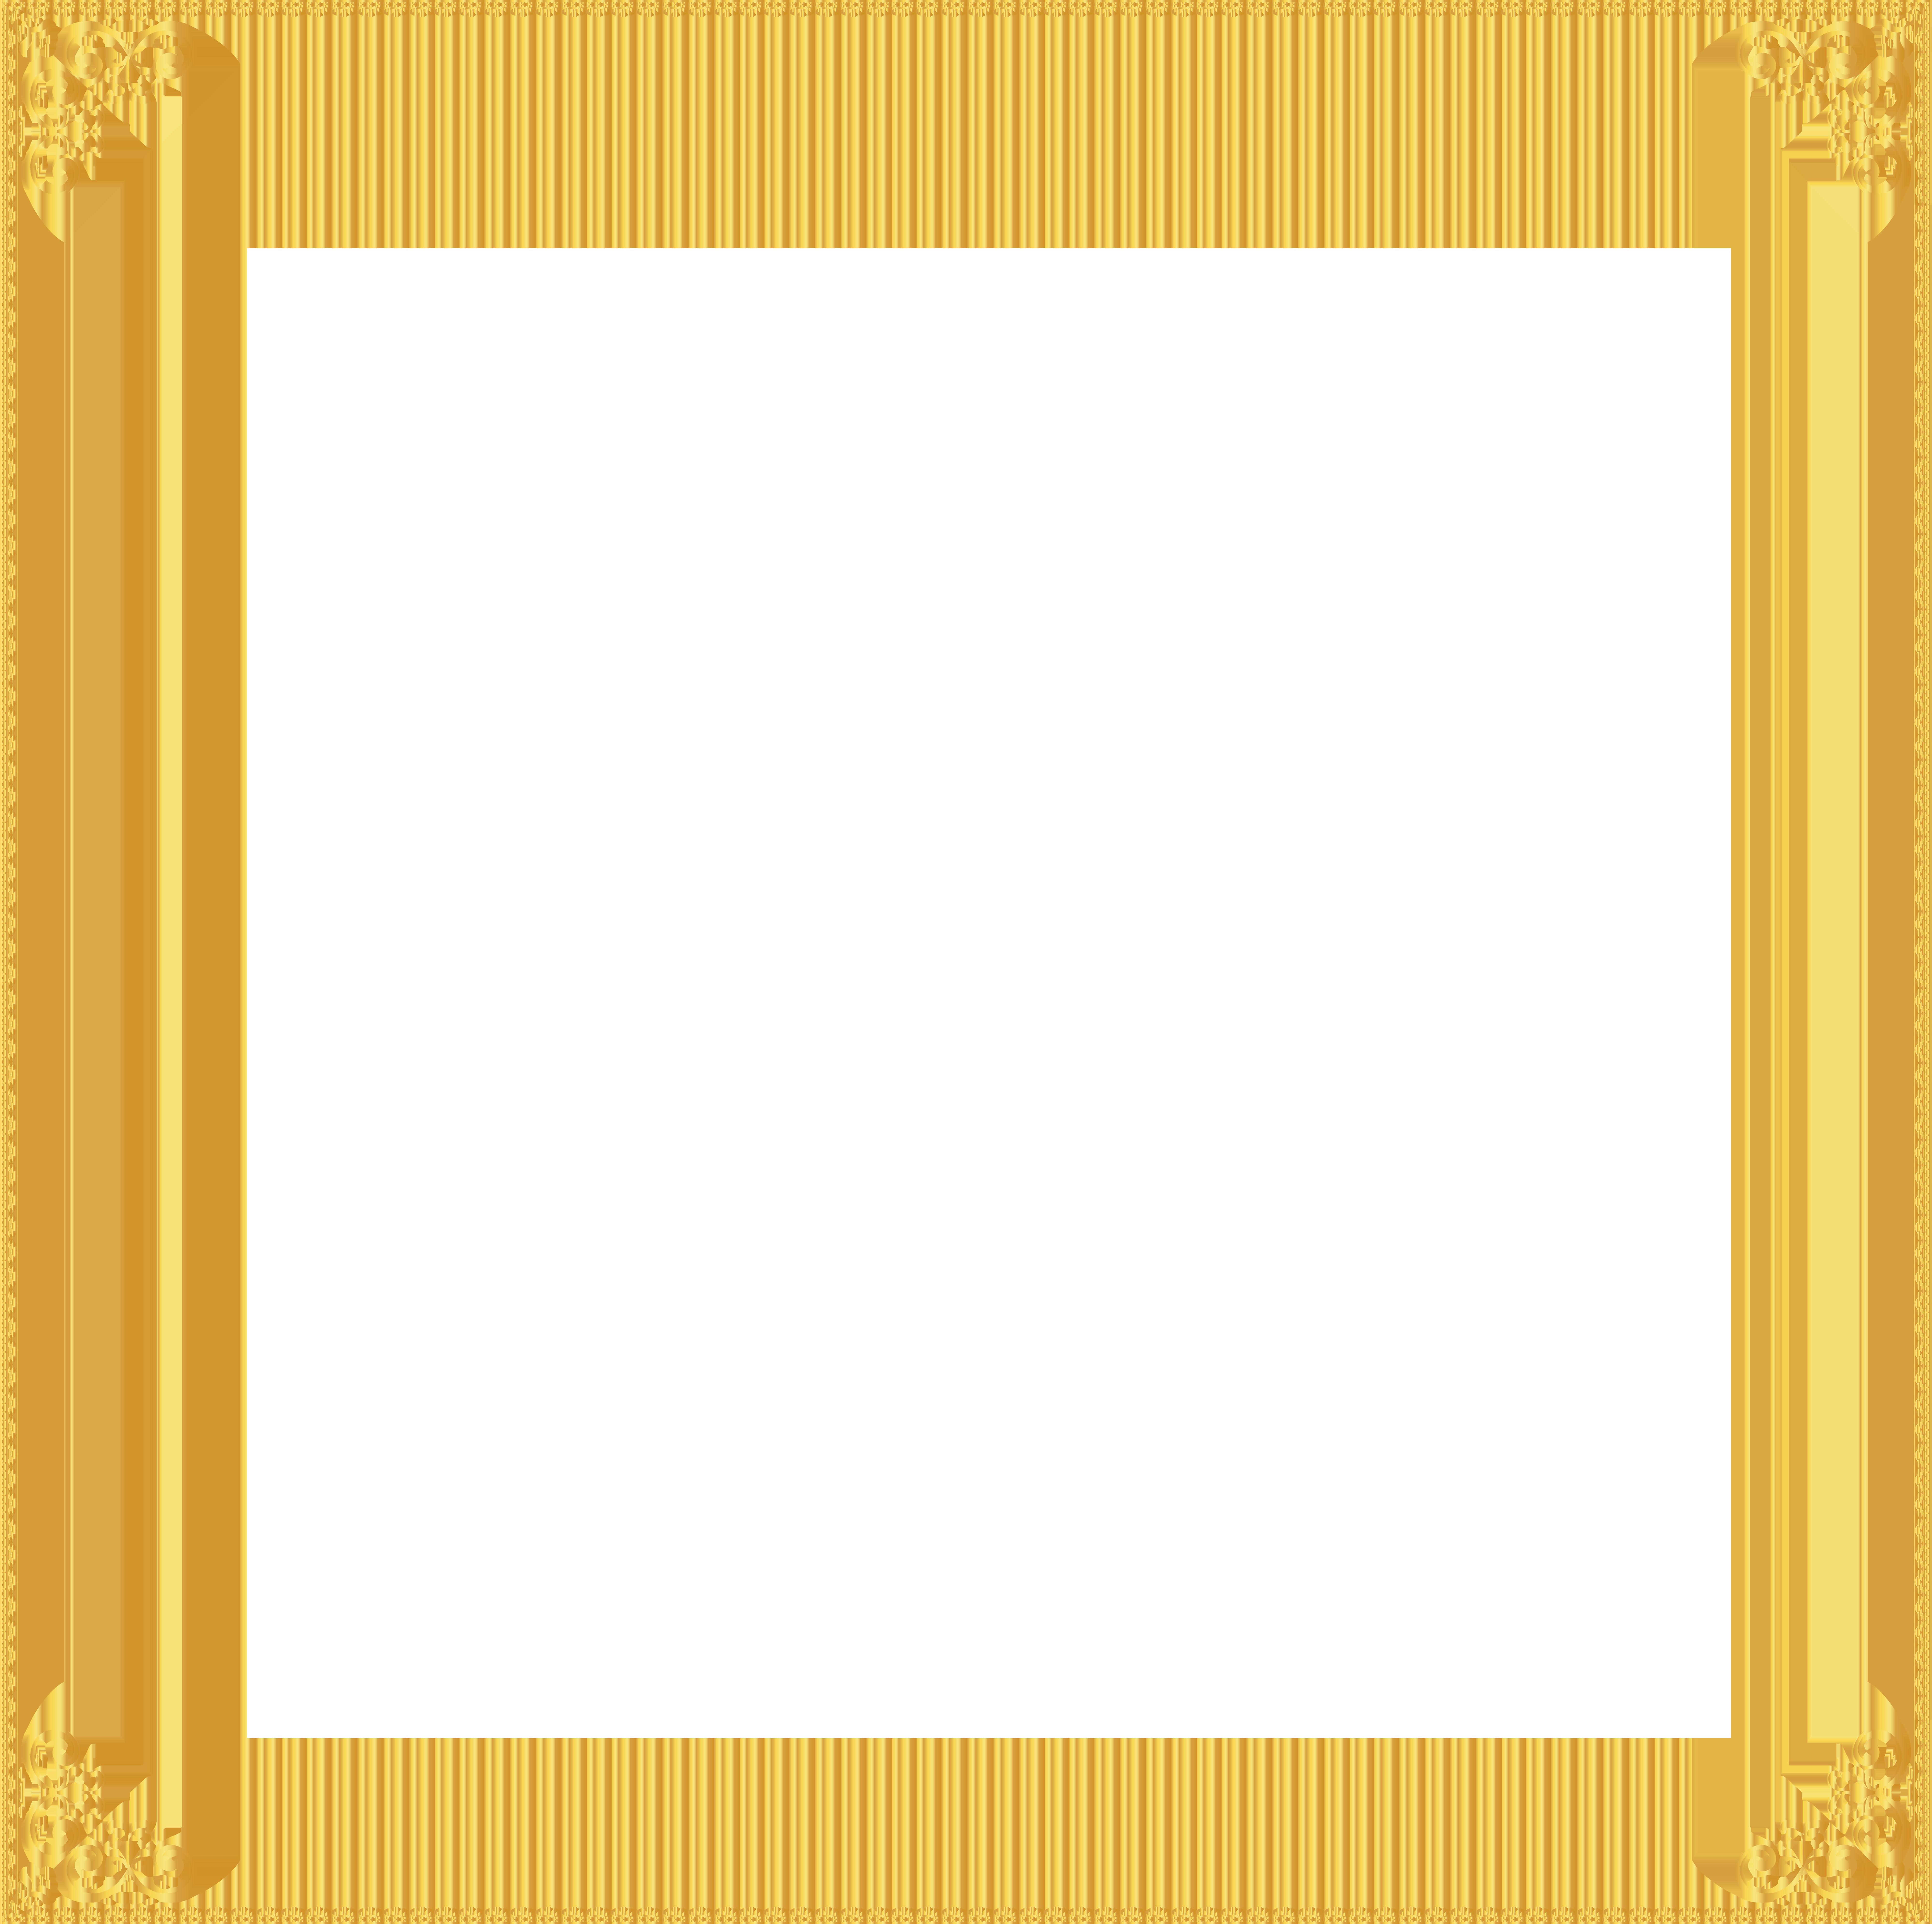 Italian clipart border. Golden frame transparent clip